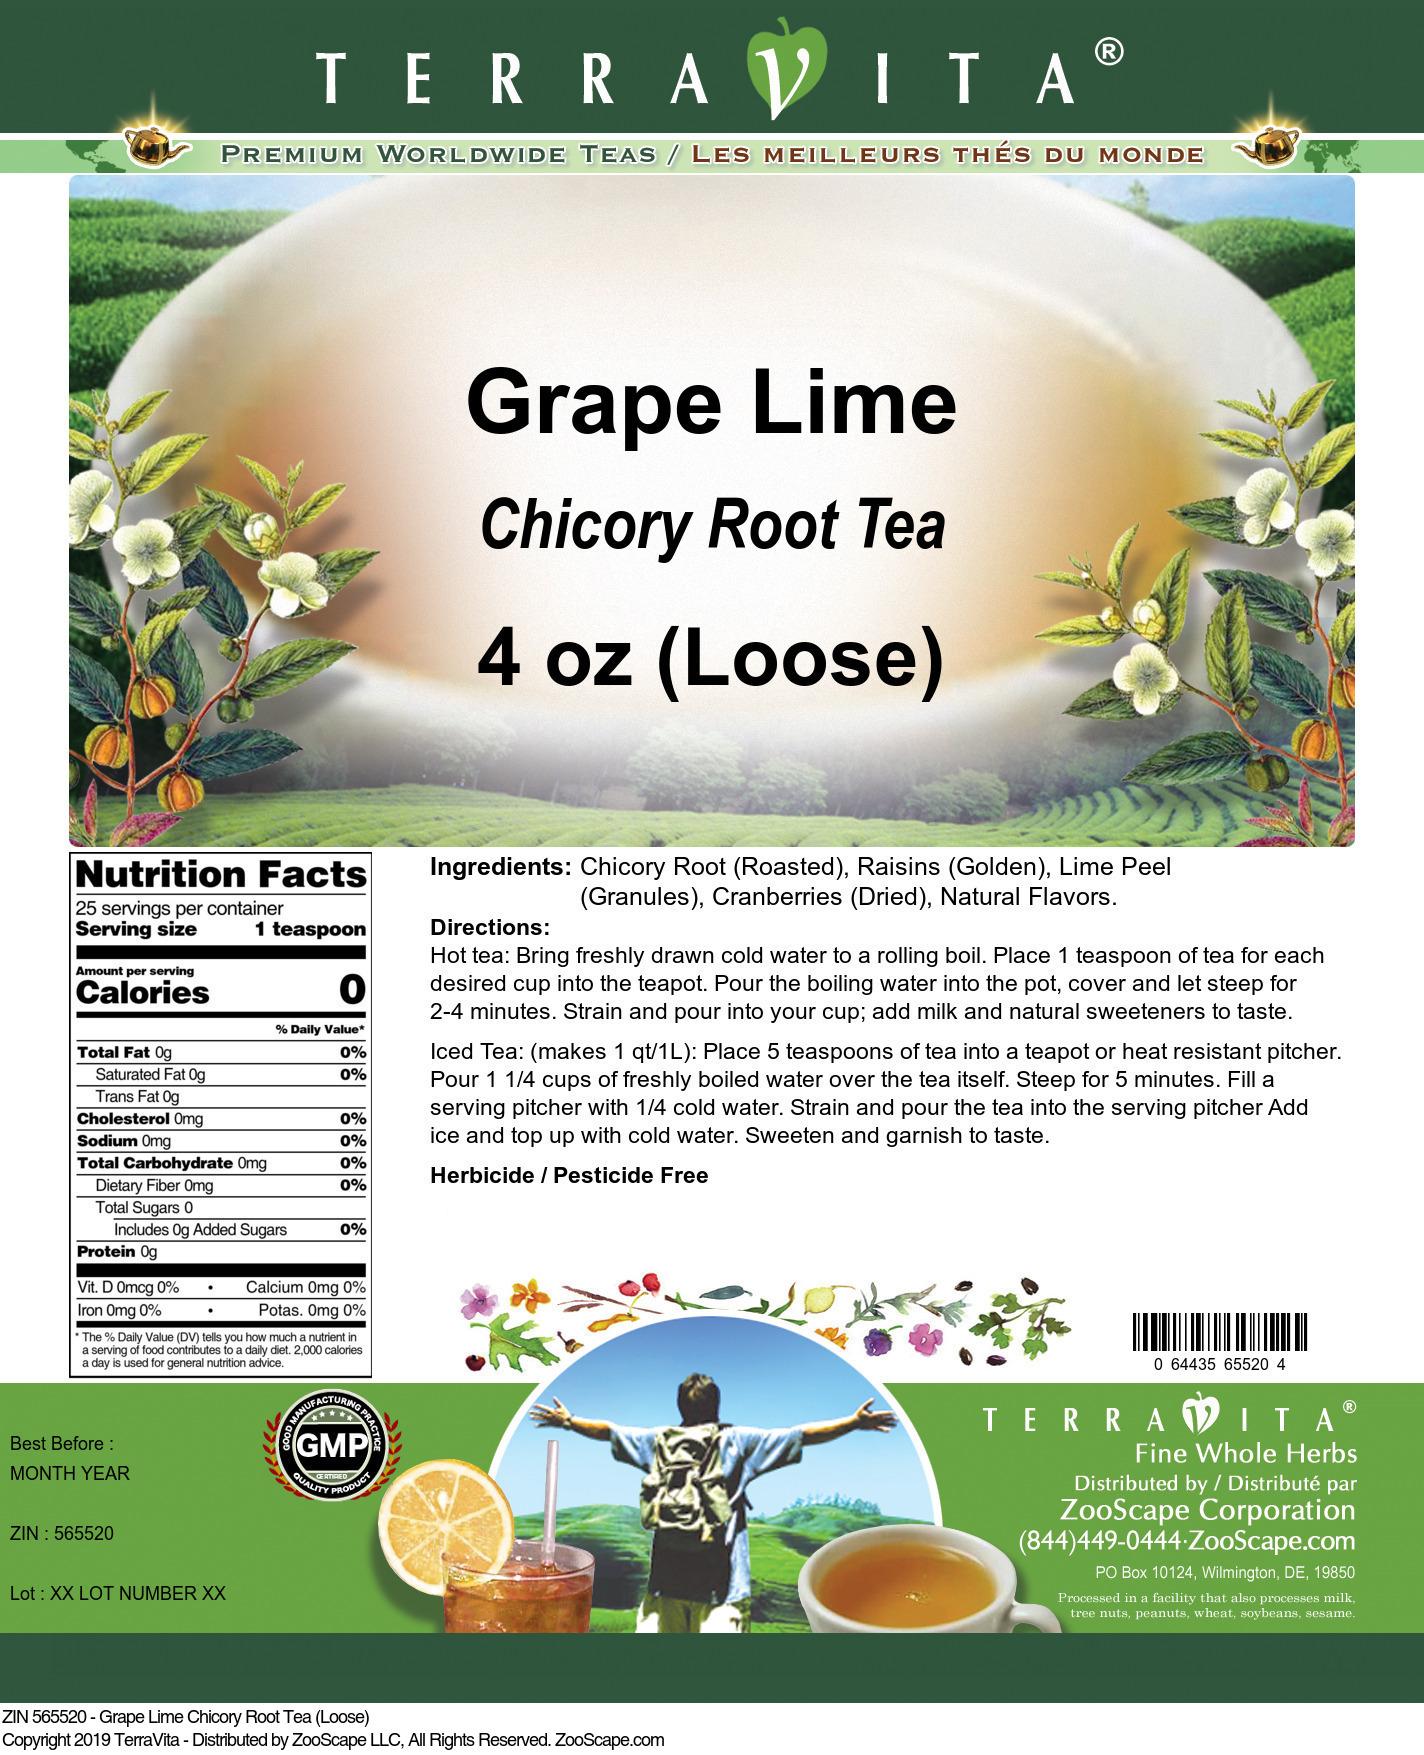 Grape Lime Chicory Root Tea (Loose)